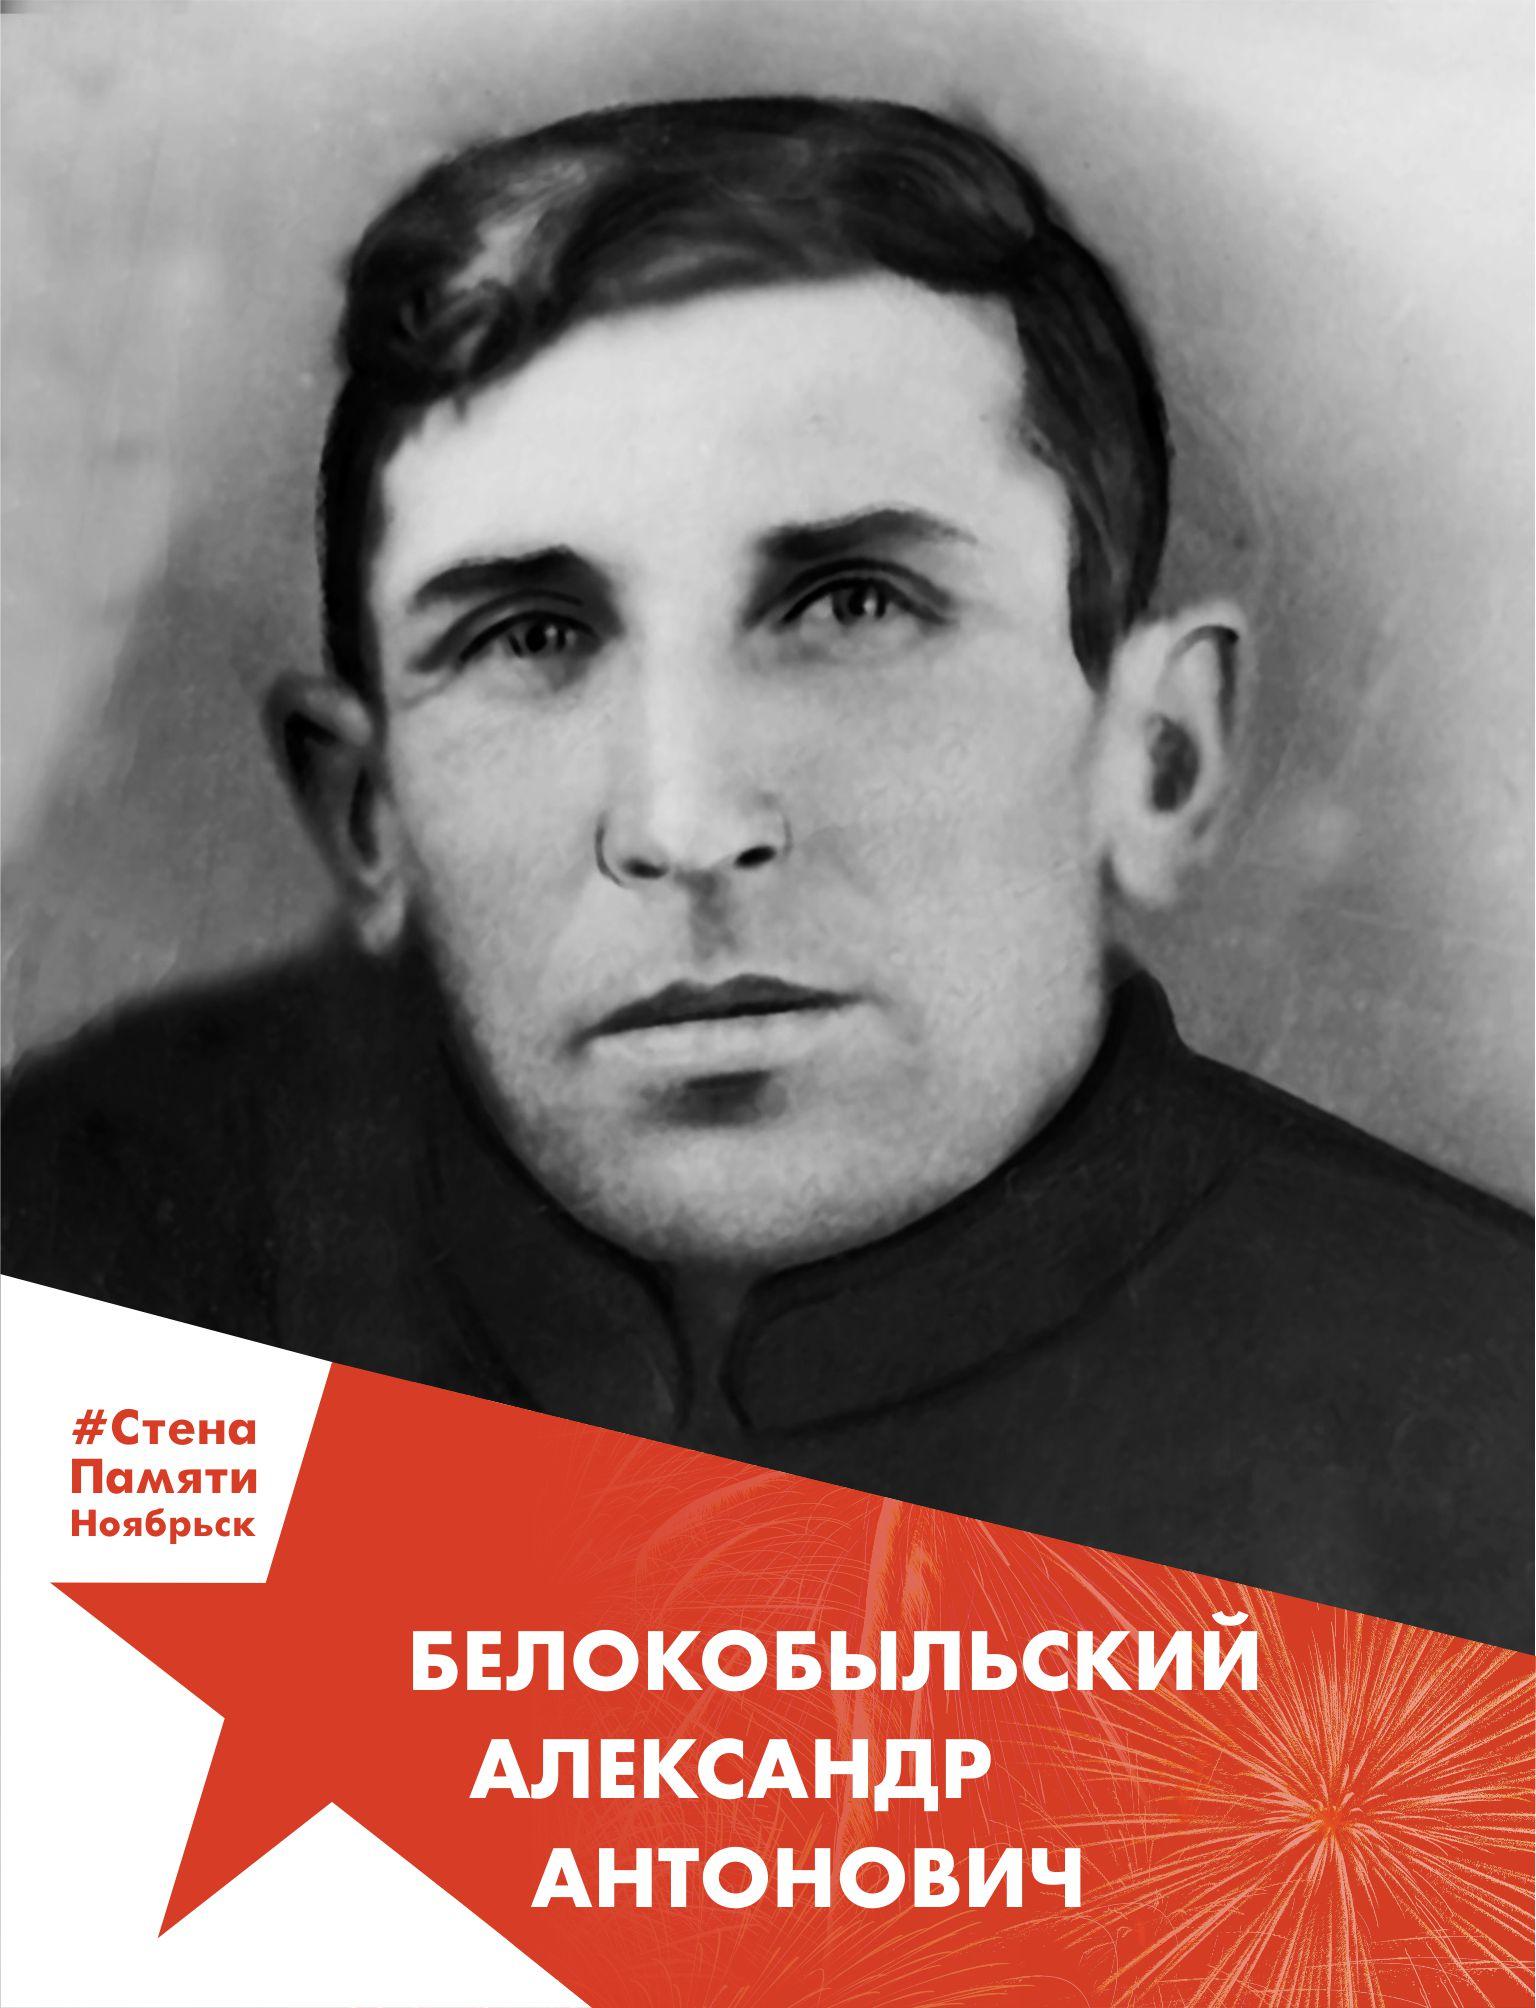 Белокобыльский Александр Антонович